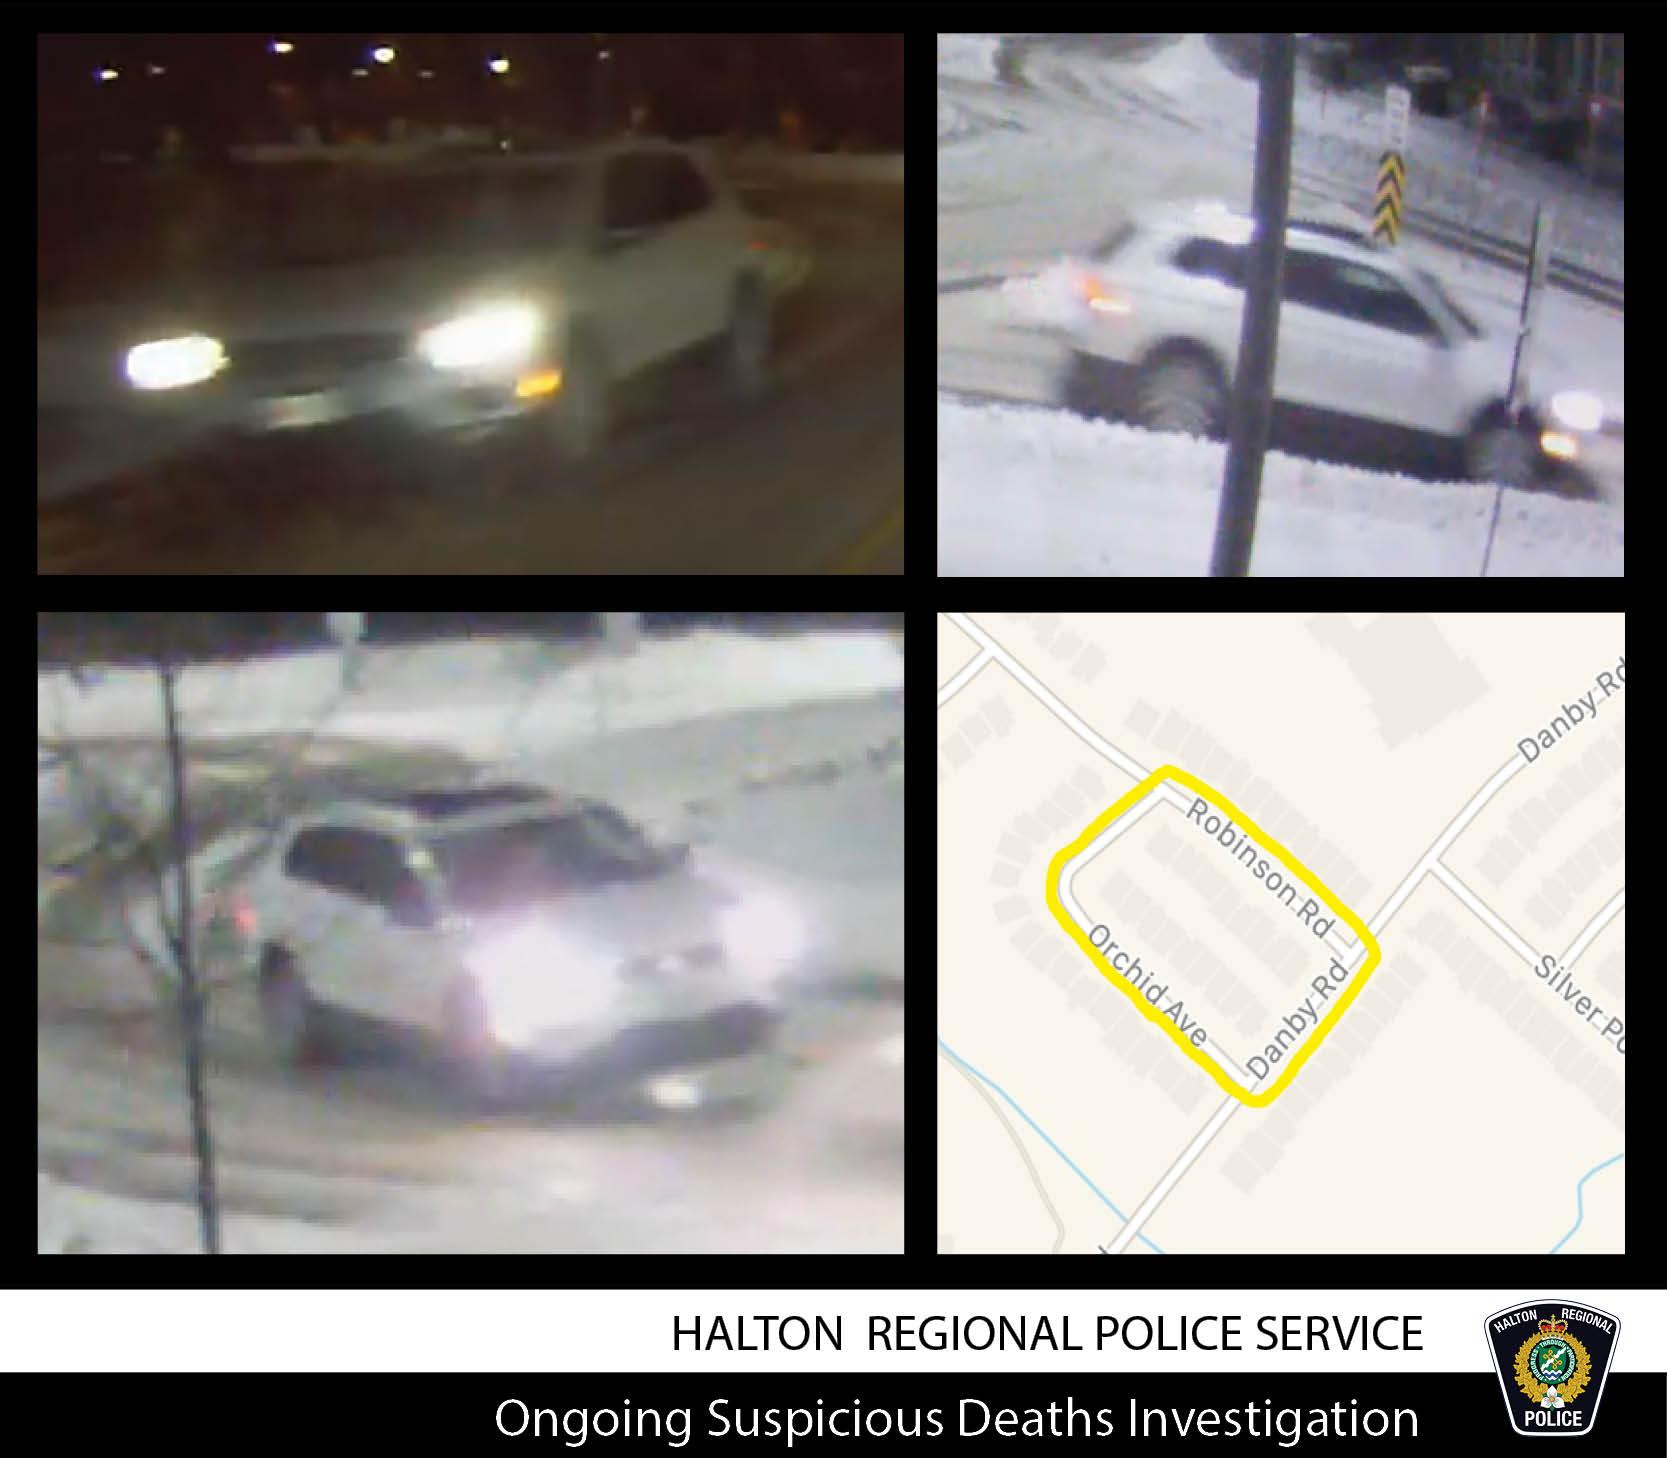 Map + Vehicle - Suspicious Deaths Investigation Feb 26 2021